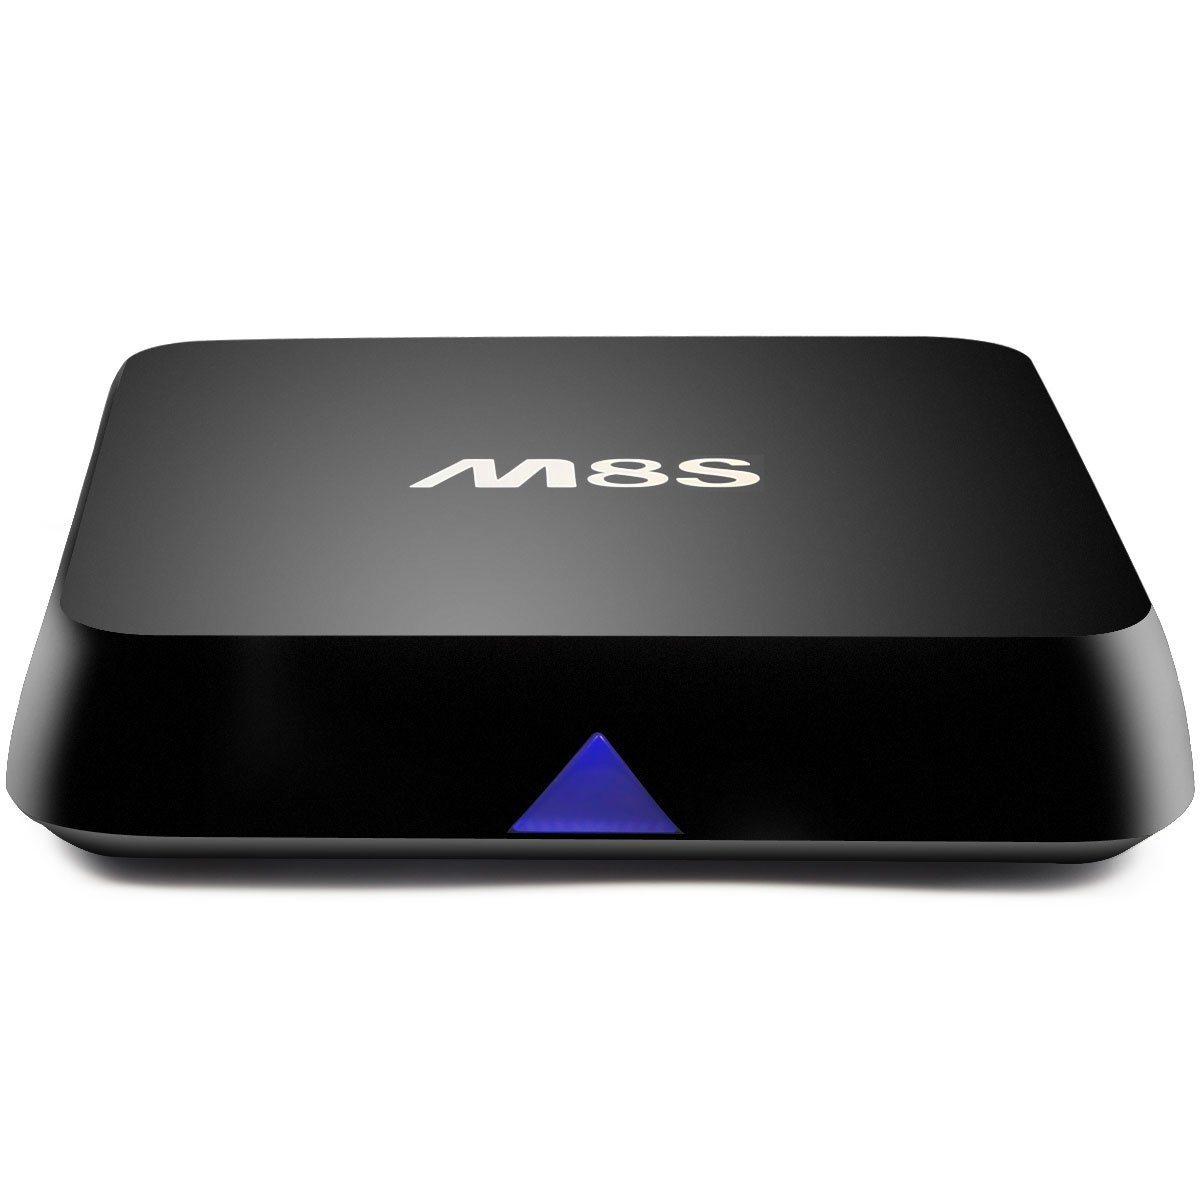 Competitive M8s Amlogic S812 Quad Core Android 2 8g TV Box Set Top Box